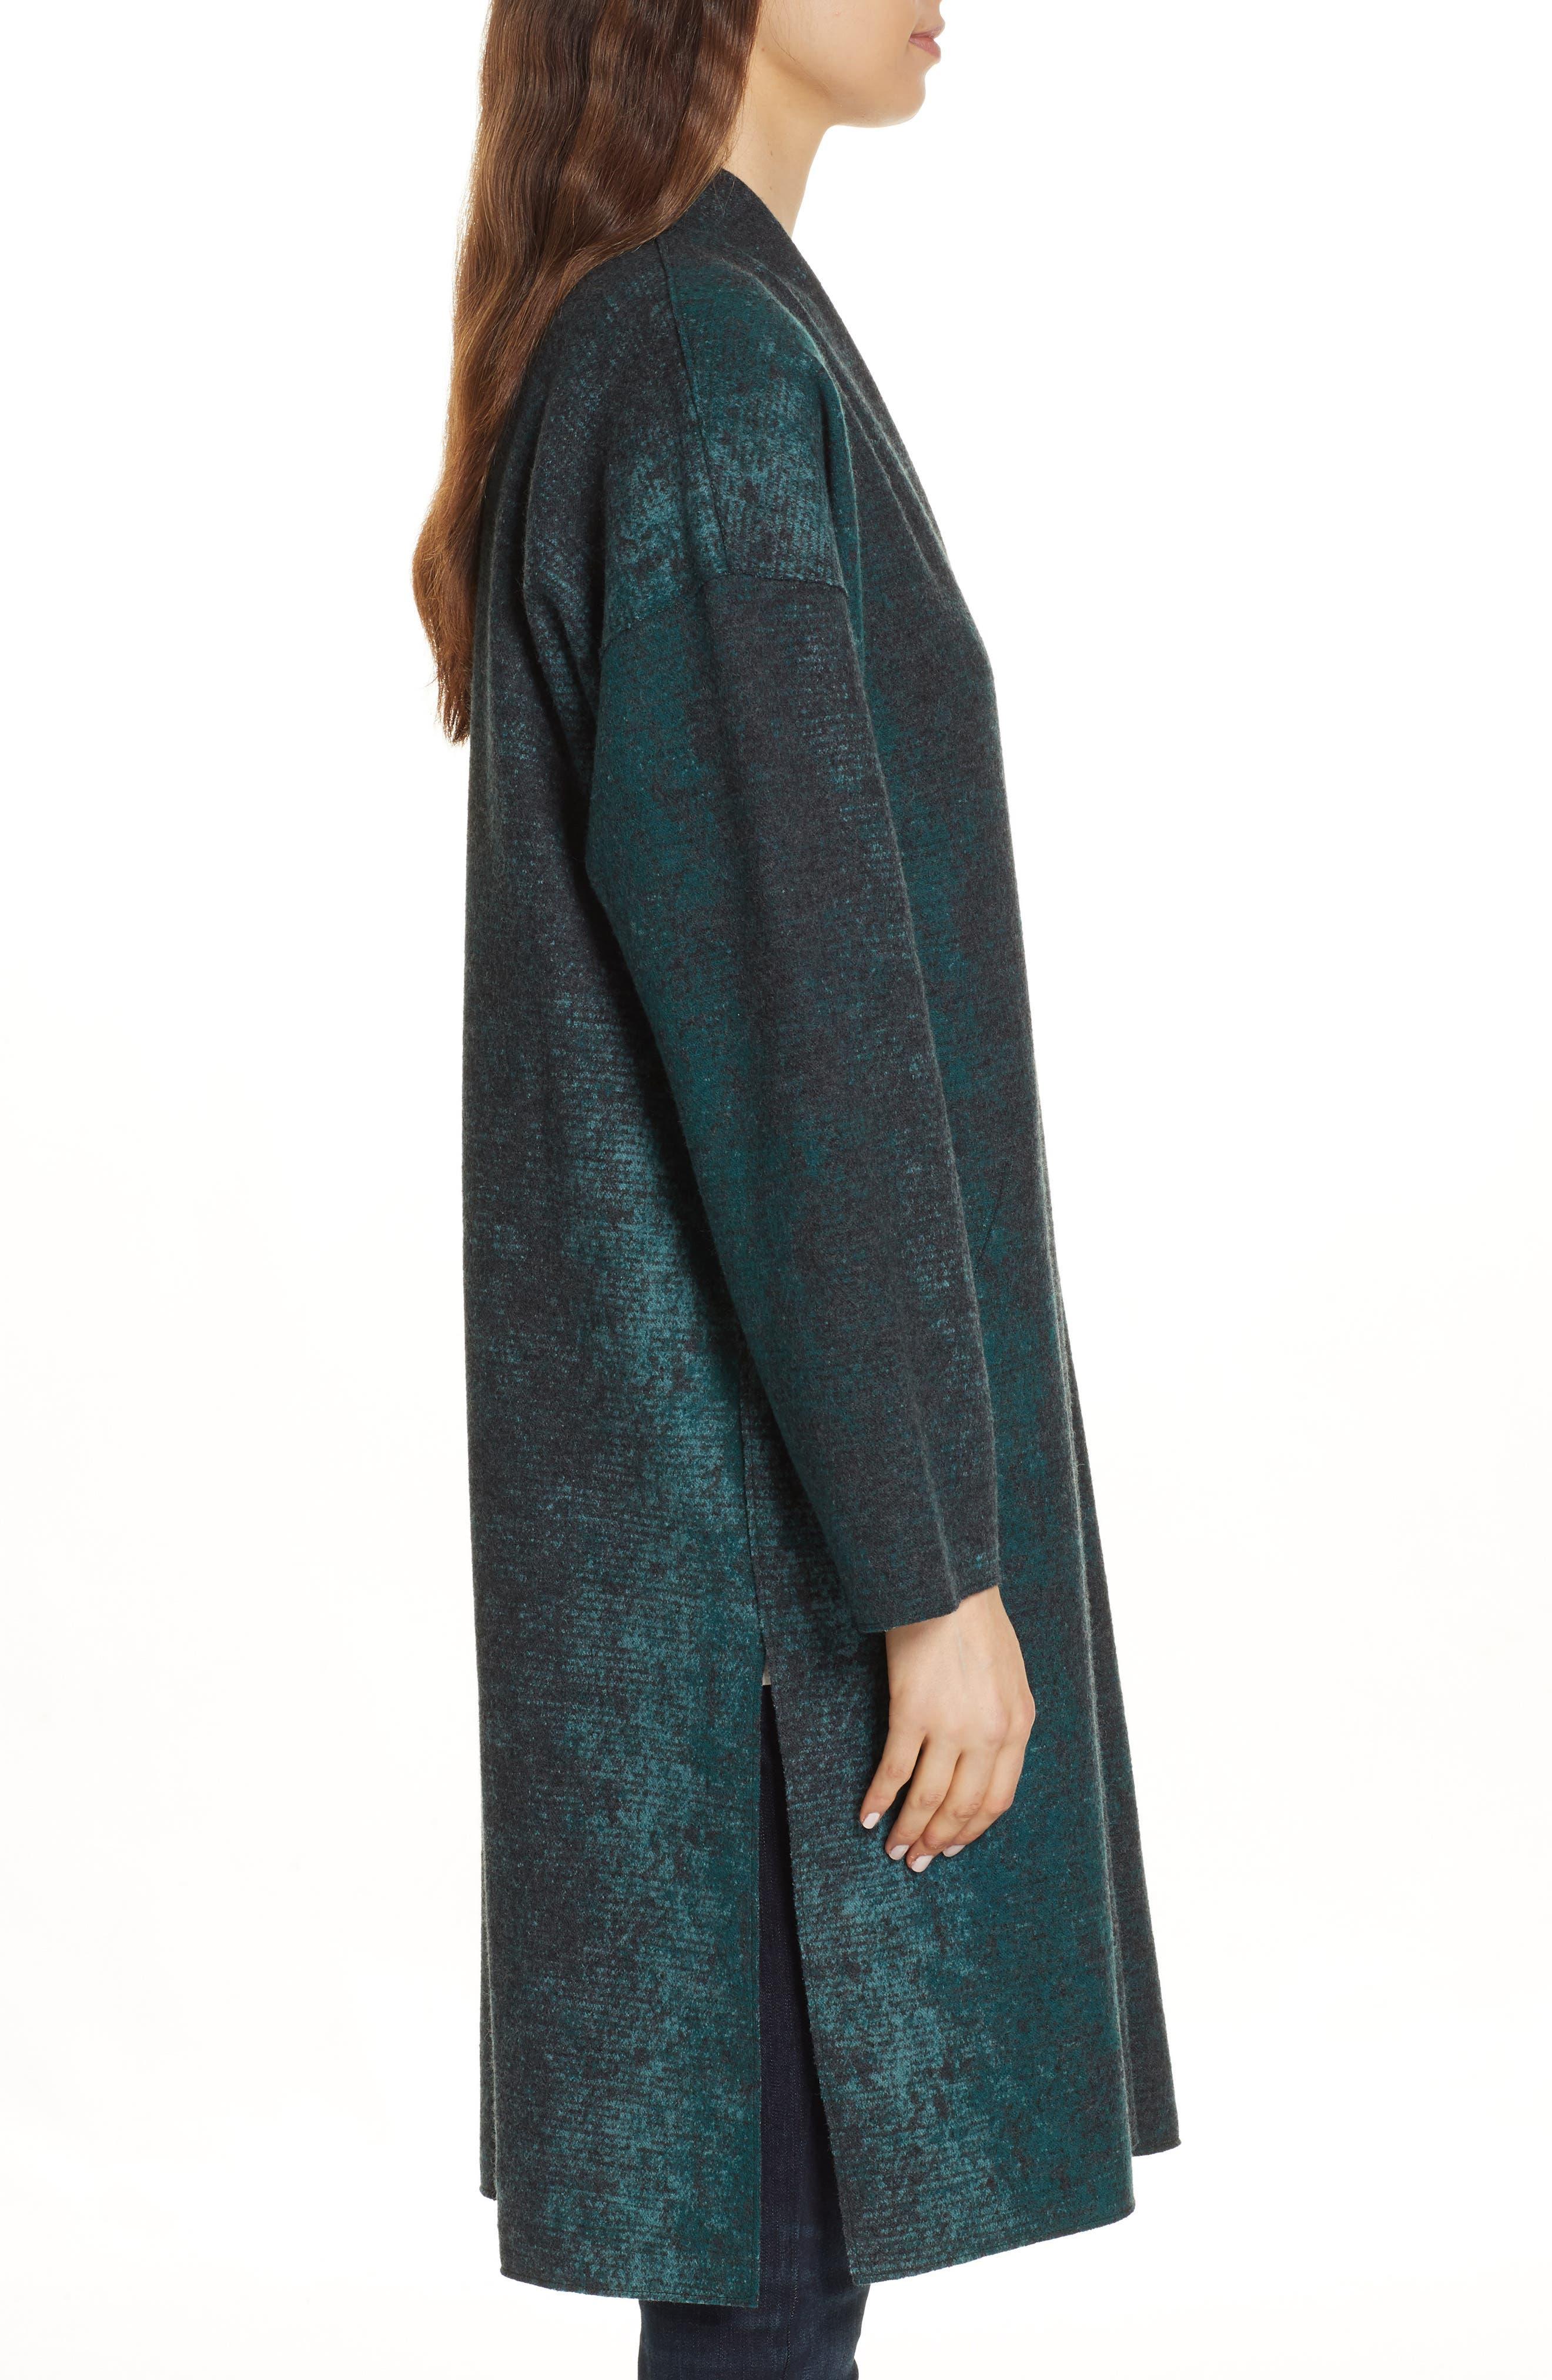 EILEEN FISHER, Wool Blend Kimono Coat, Alternate thumbnail 4, color, PINE